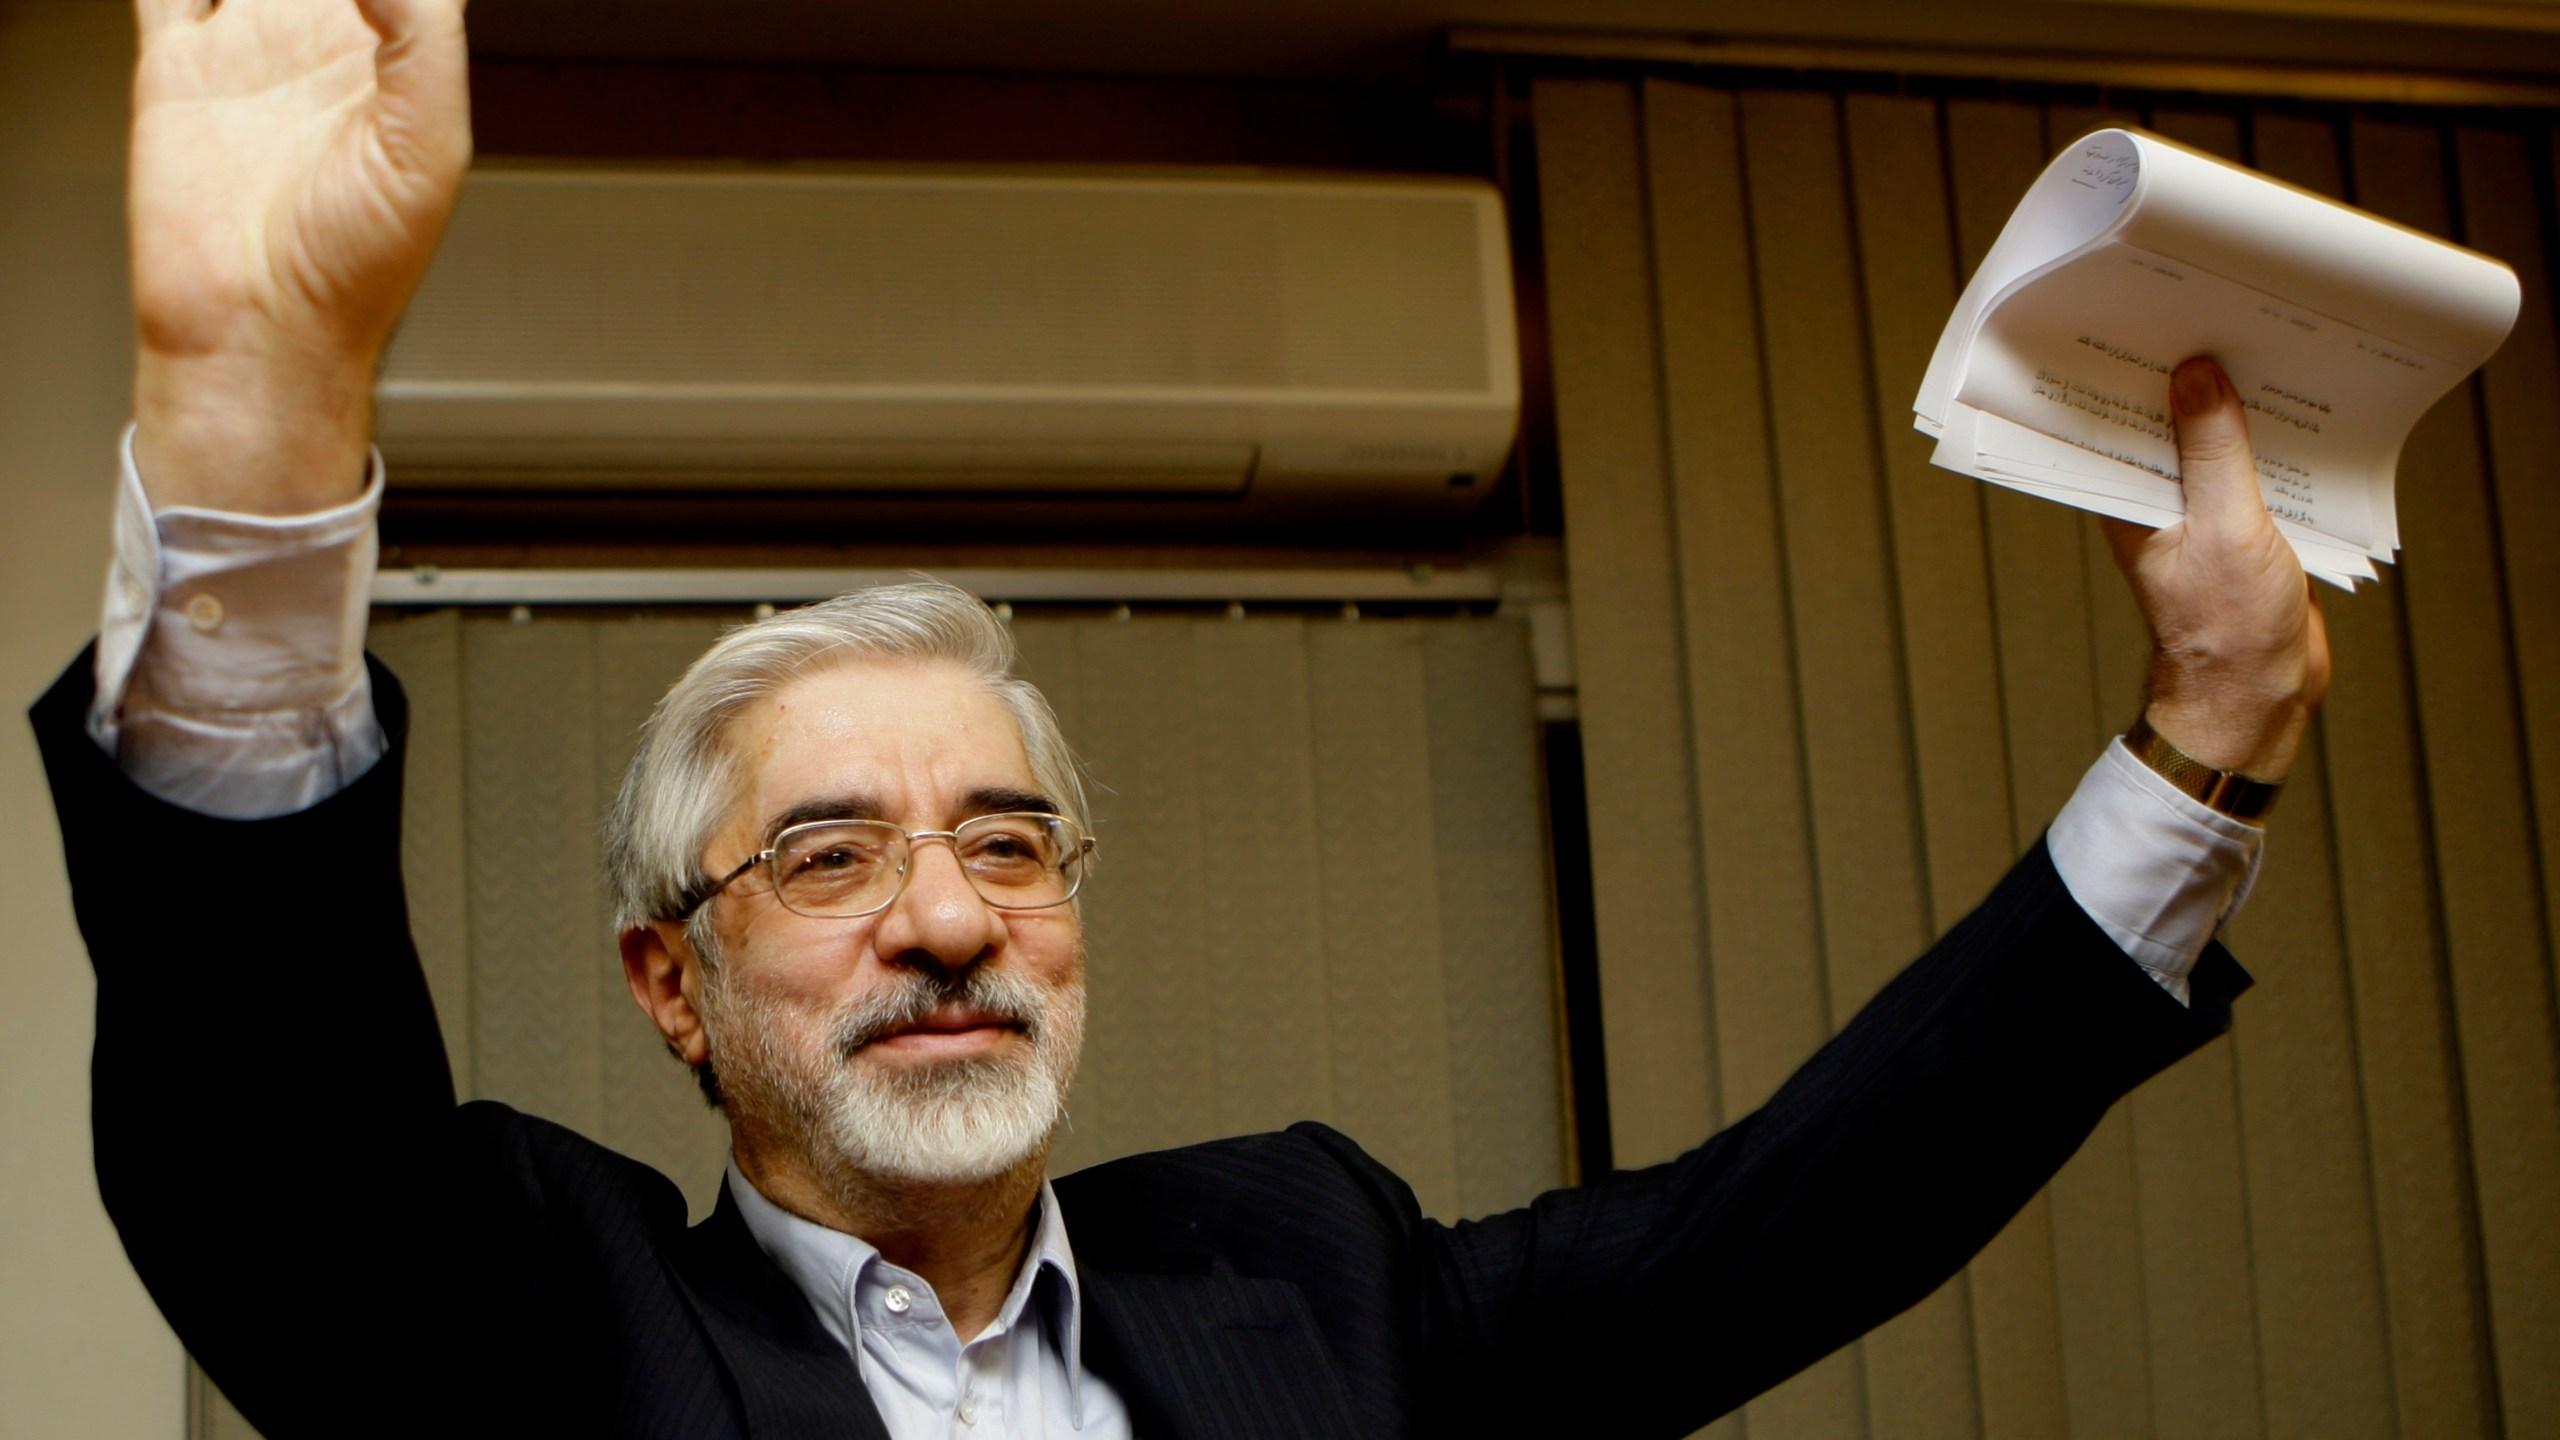 Mir Hossein Mousavi